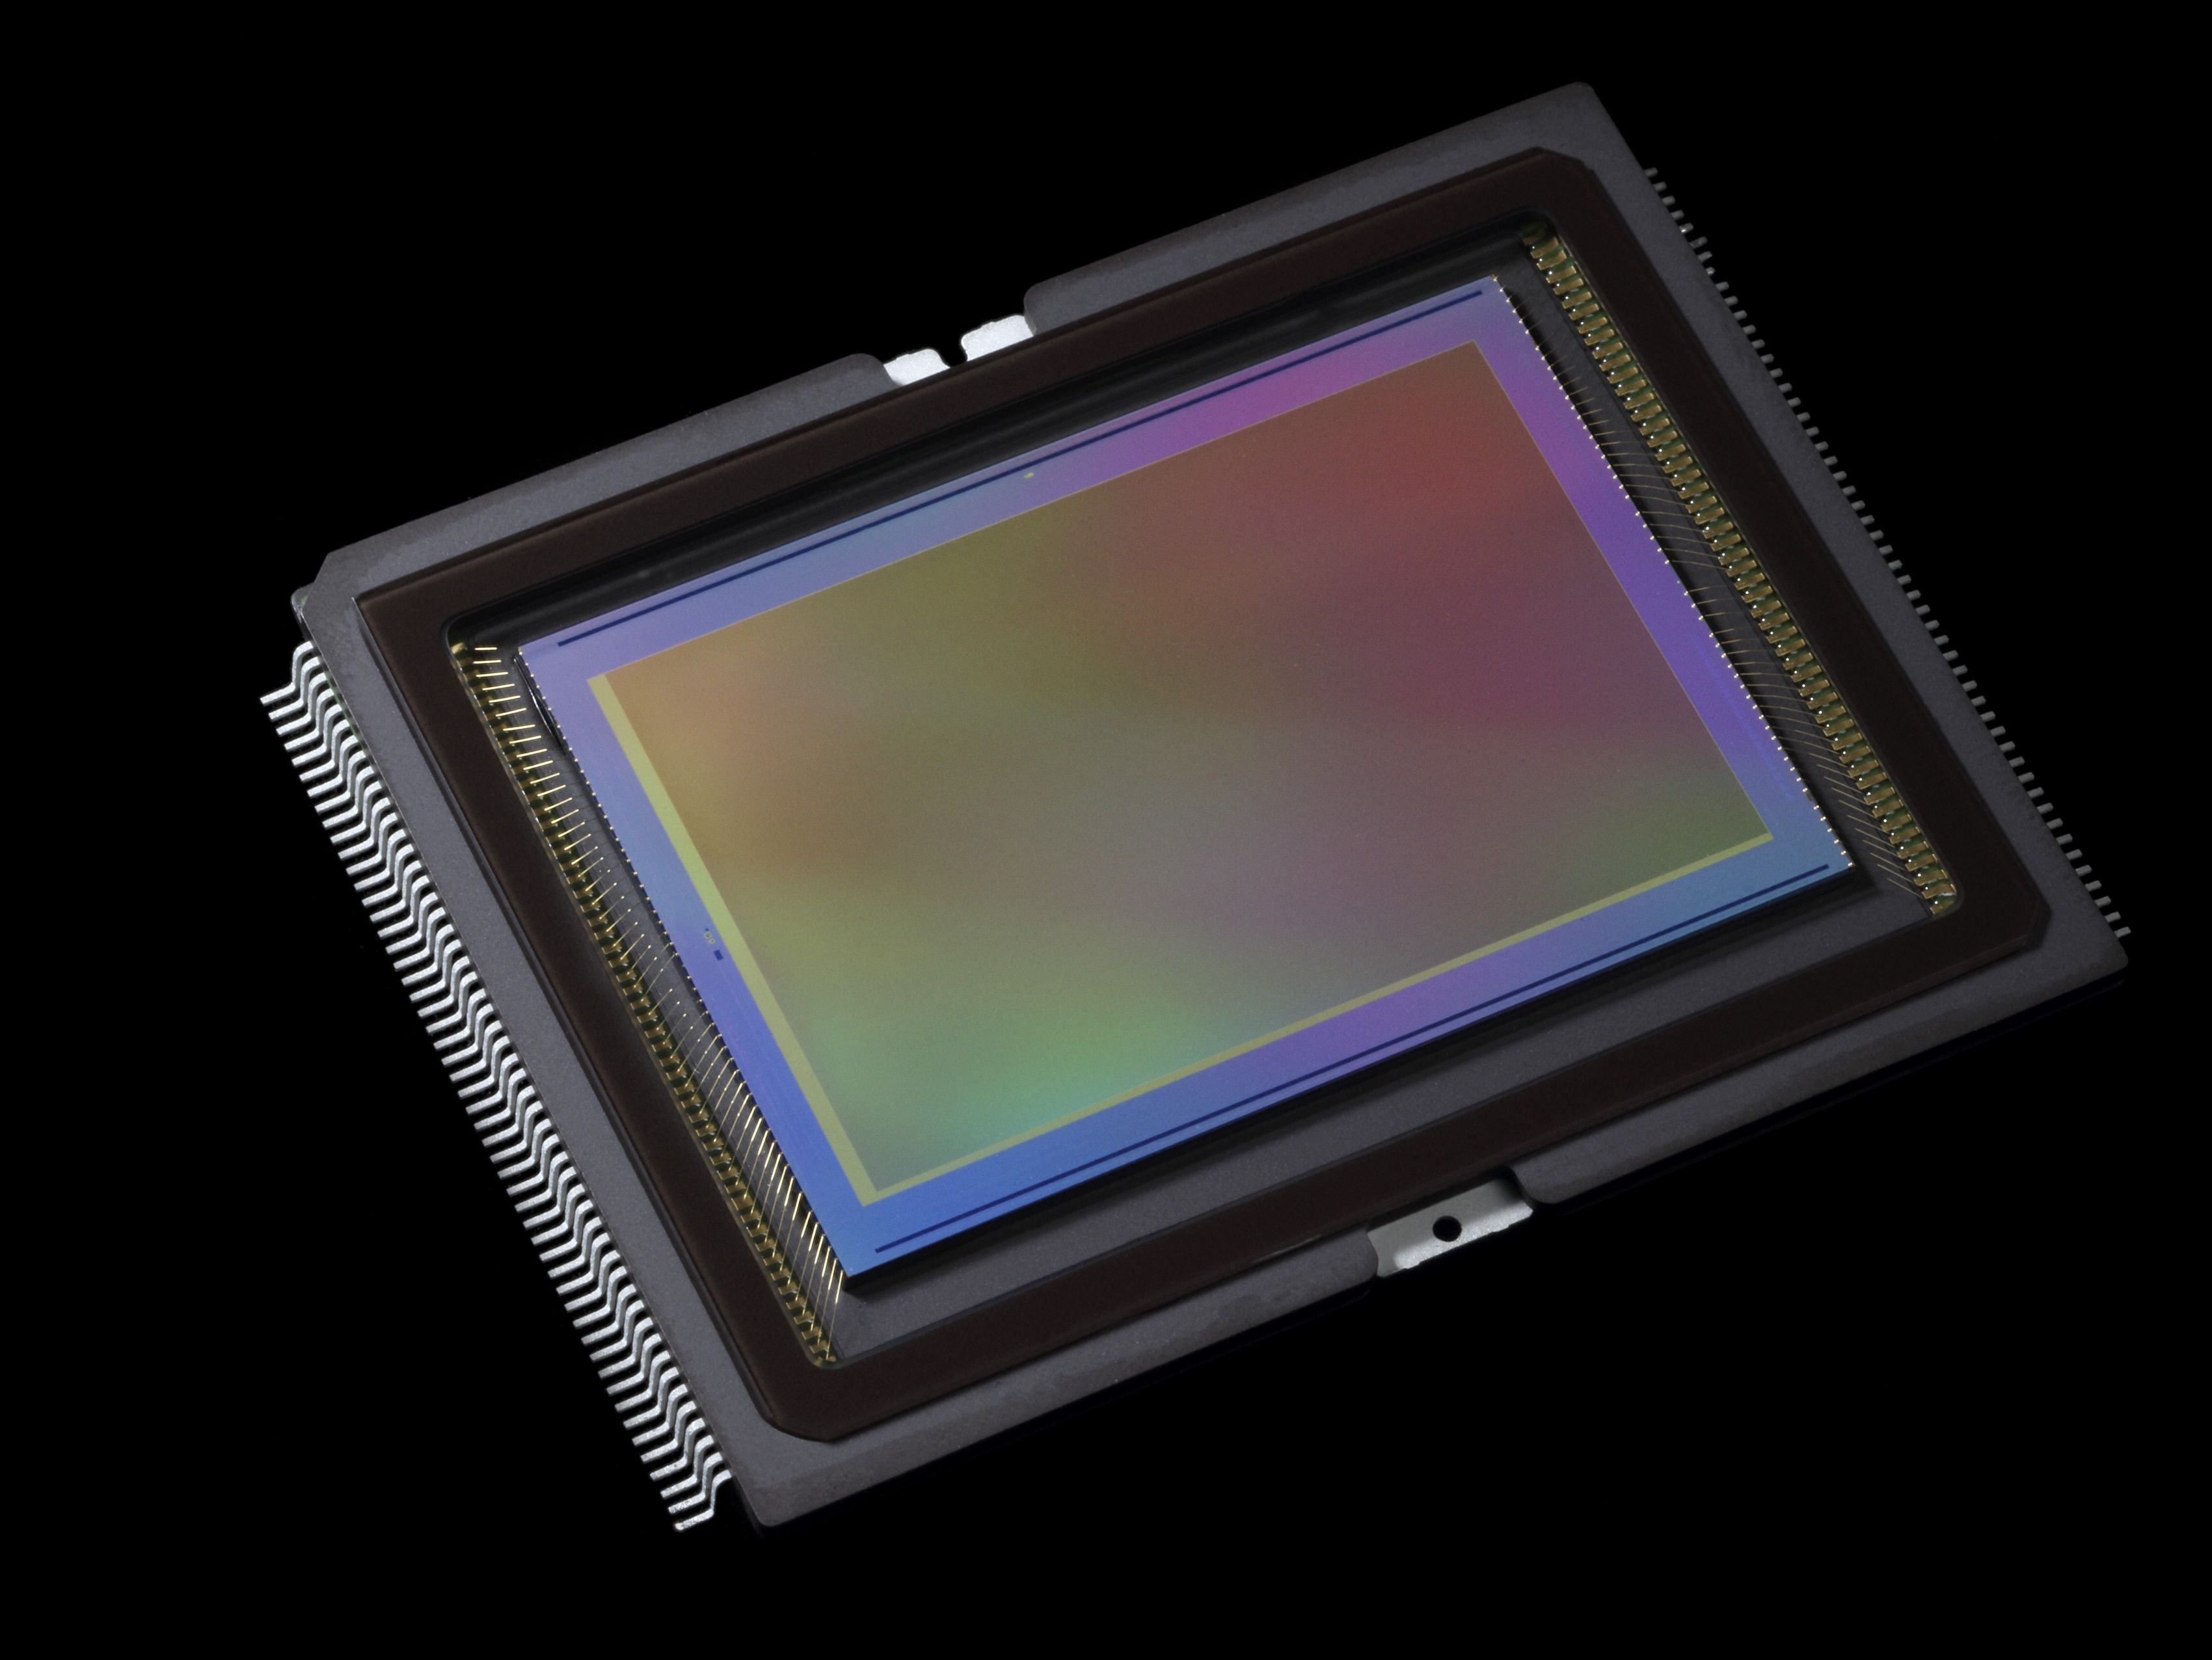 Canons nye 50-megapiksels bildebrikke. Foto: Canon